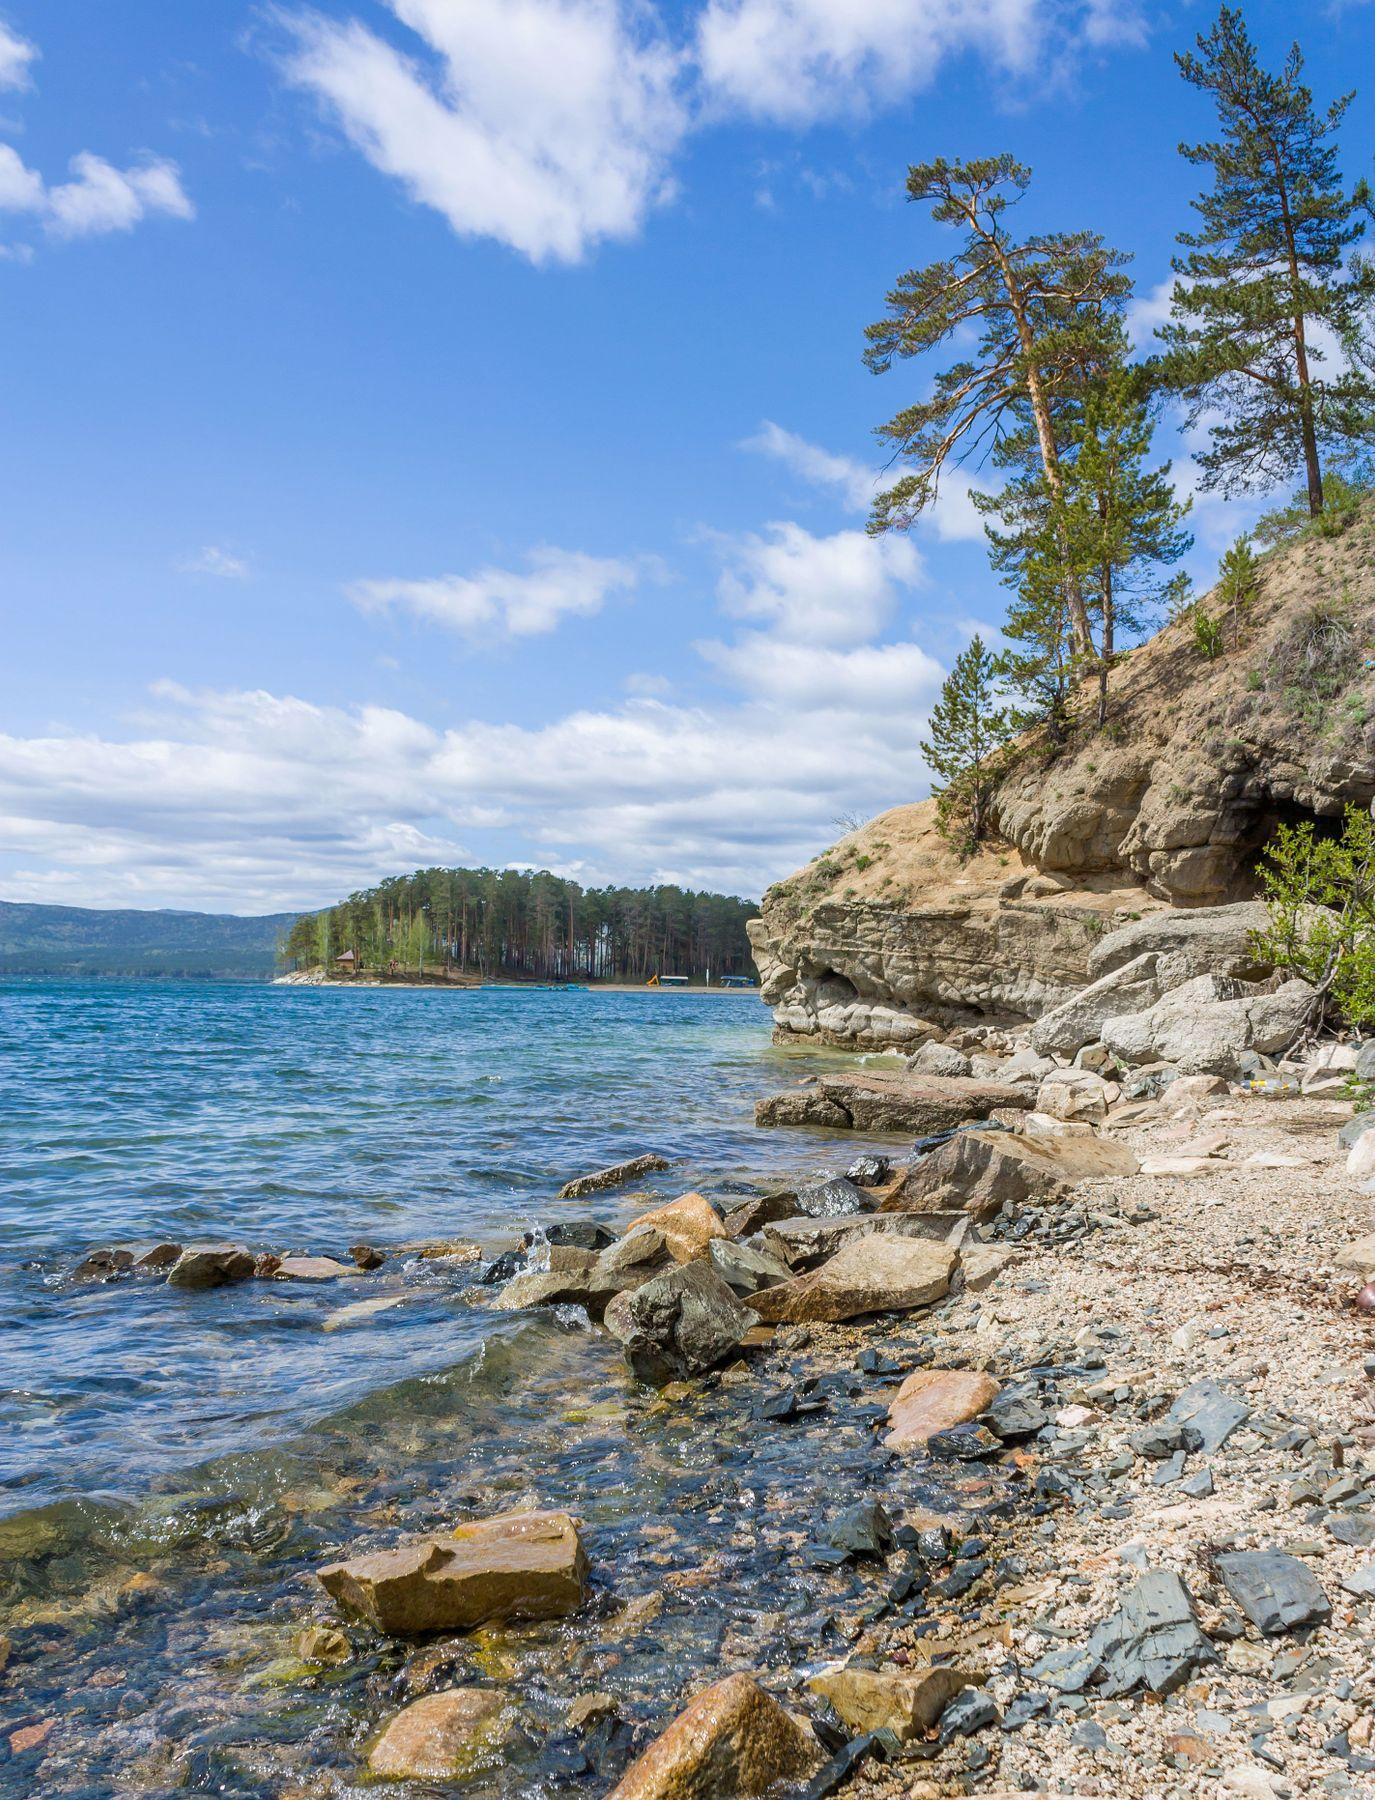 Озеро Тургояк. Южный Урал Миасс Тургояк природа лес весна Май